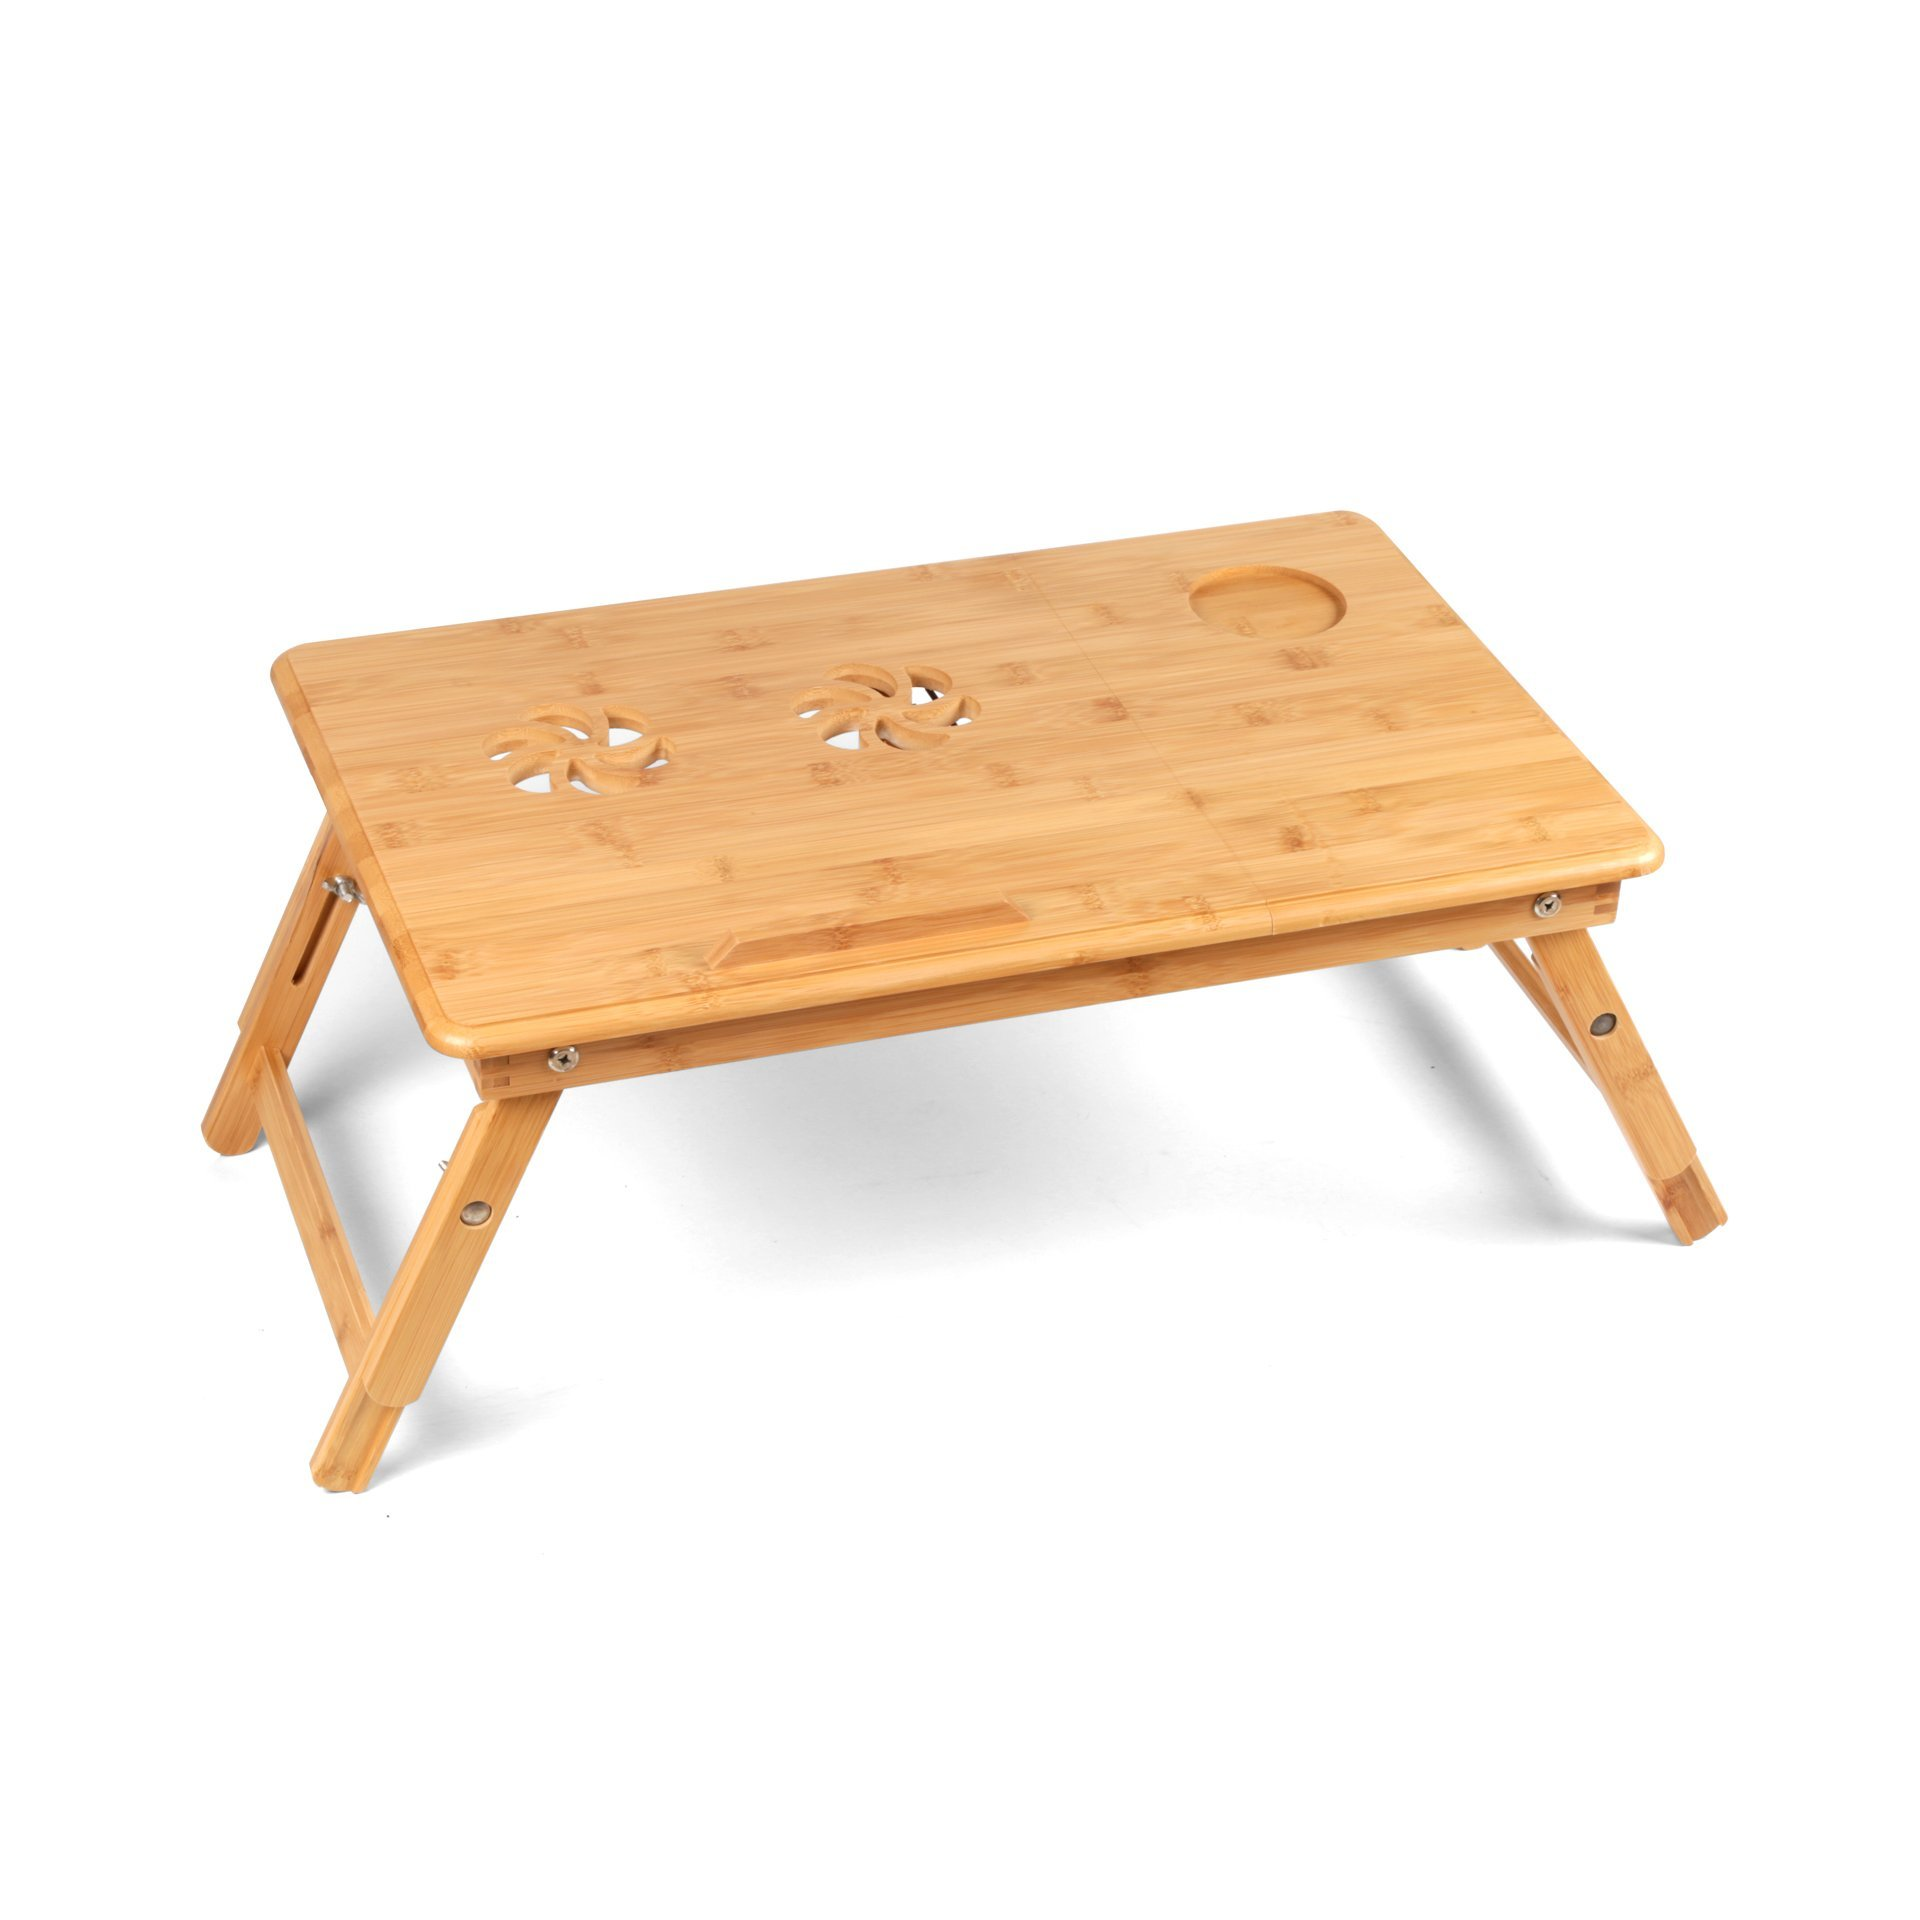 Bamboolifer bamboo-1 1 Laptop Table, Natural